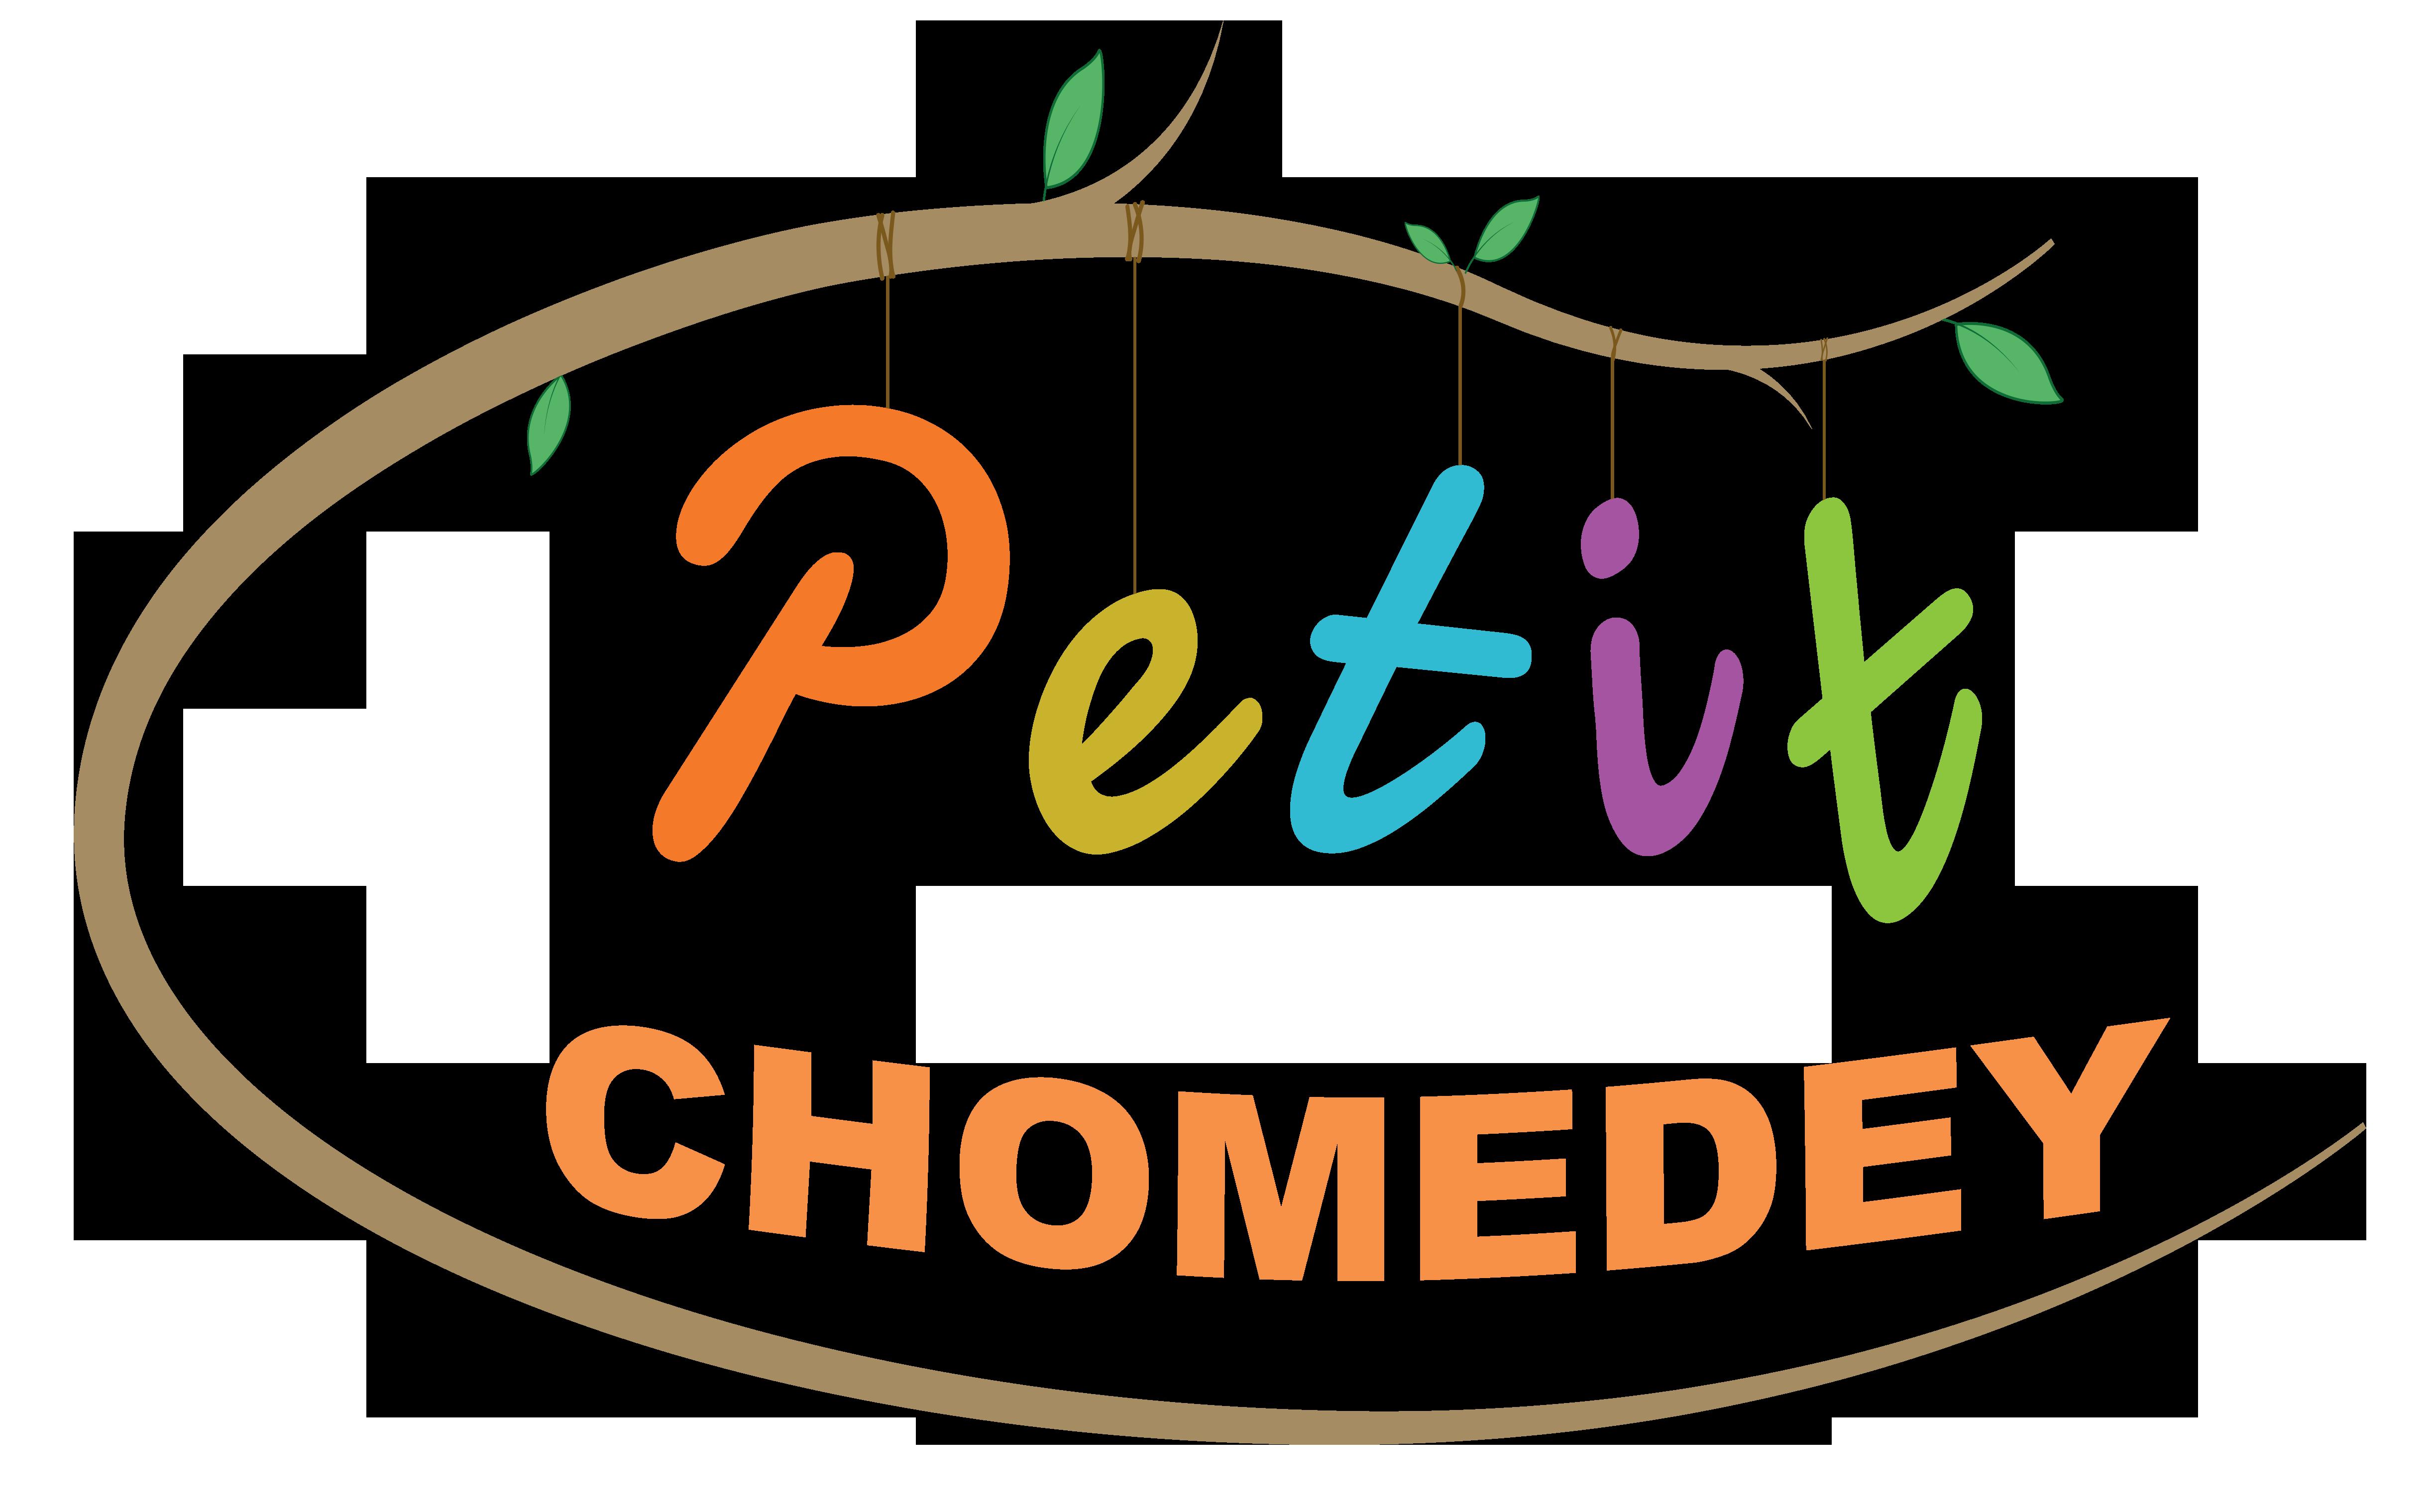 Le Petit Chomedey